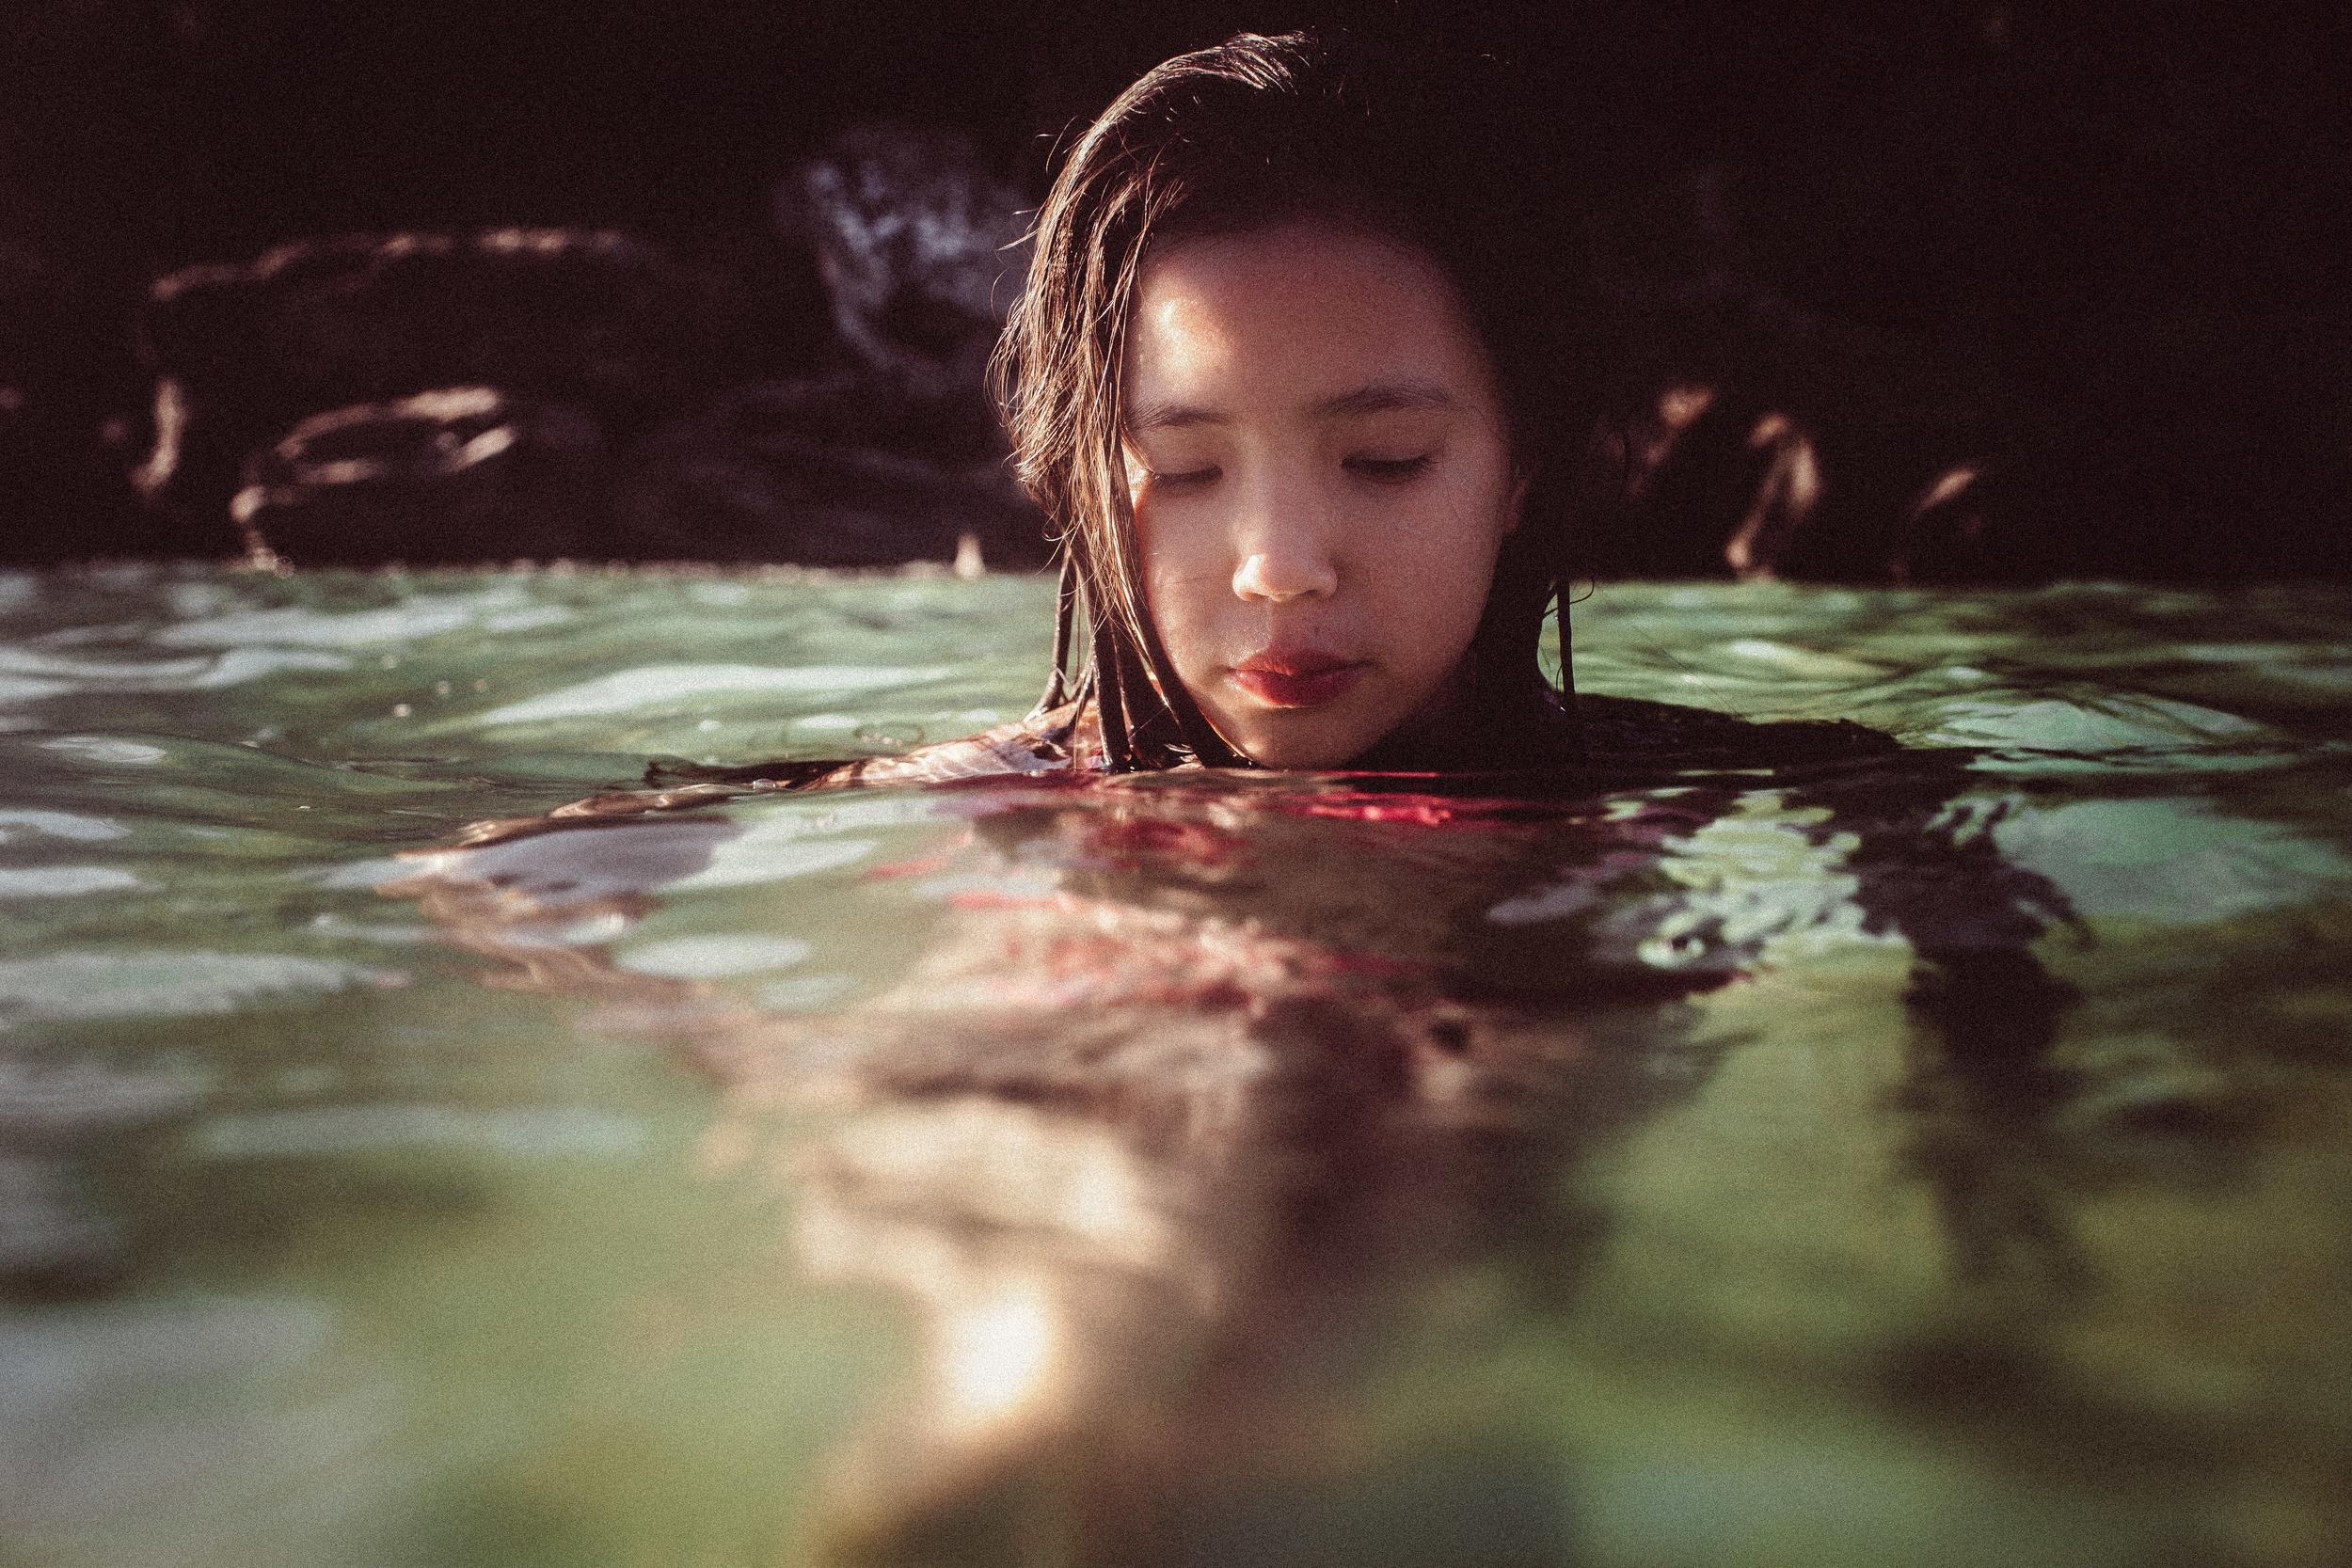 underwaterphotography (9 of 9).jpg